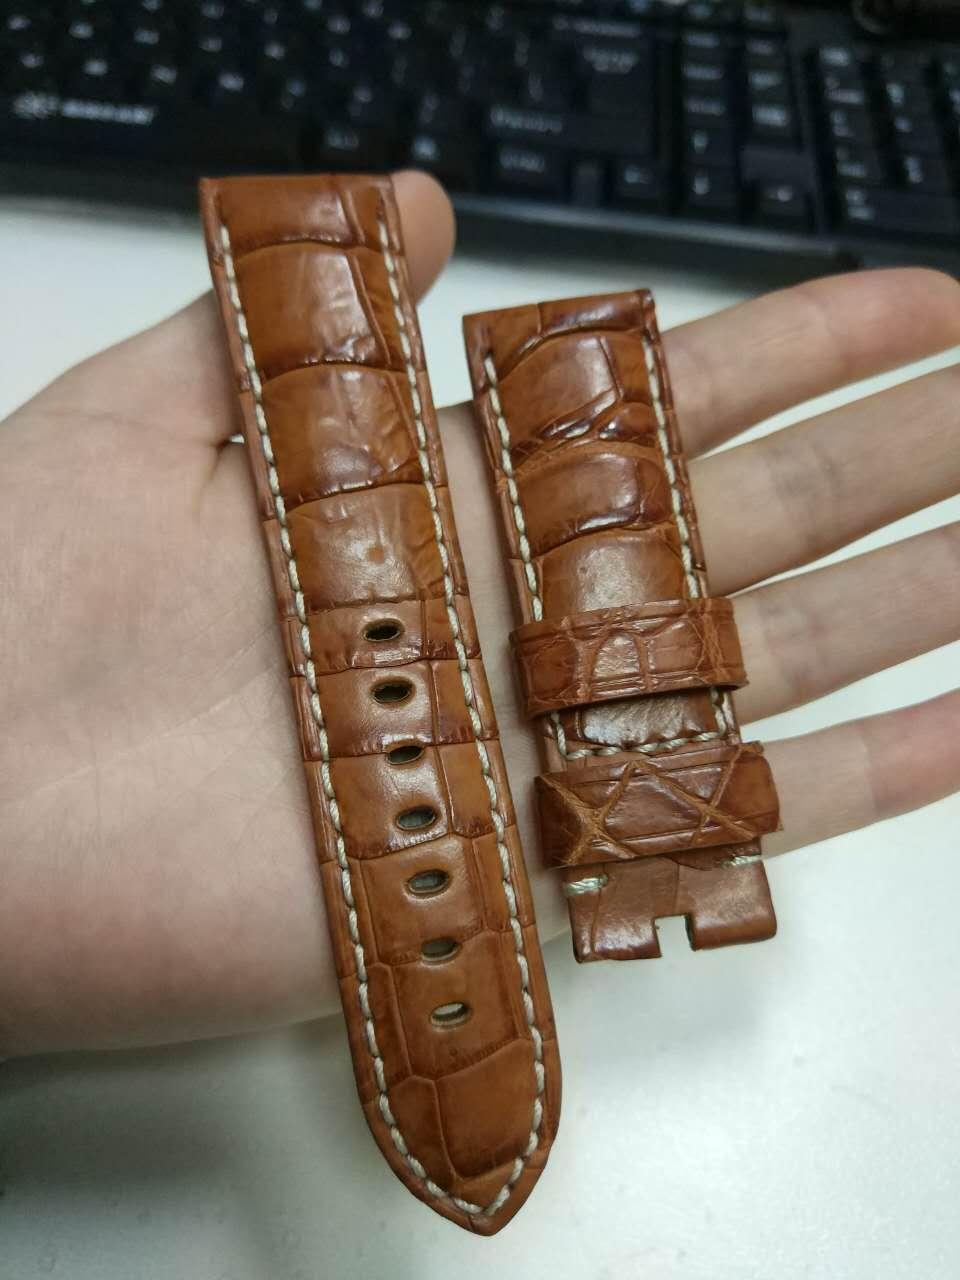 A191 Luxury Brown Alligator Genuine Leather Watch Strap 24/22mm Watchband a017 luxury alligator genuine leather strap 22 18mm 100% handmade watch strap